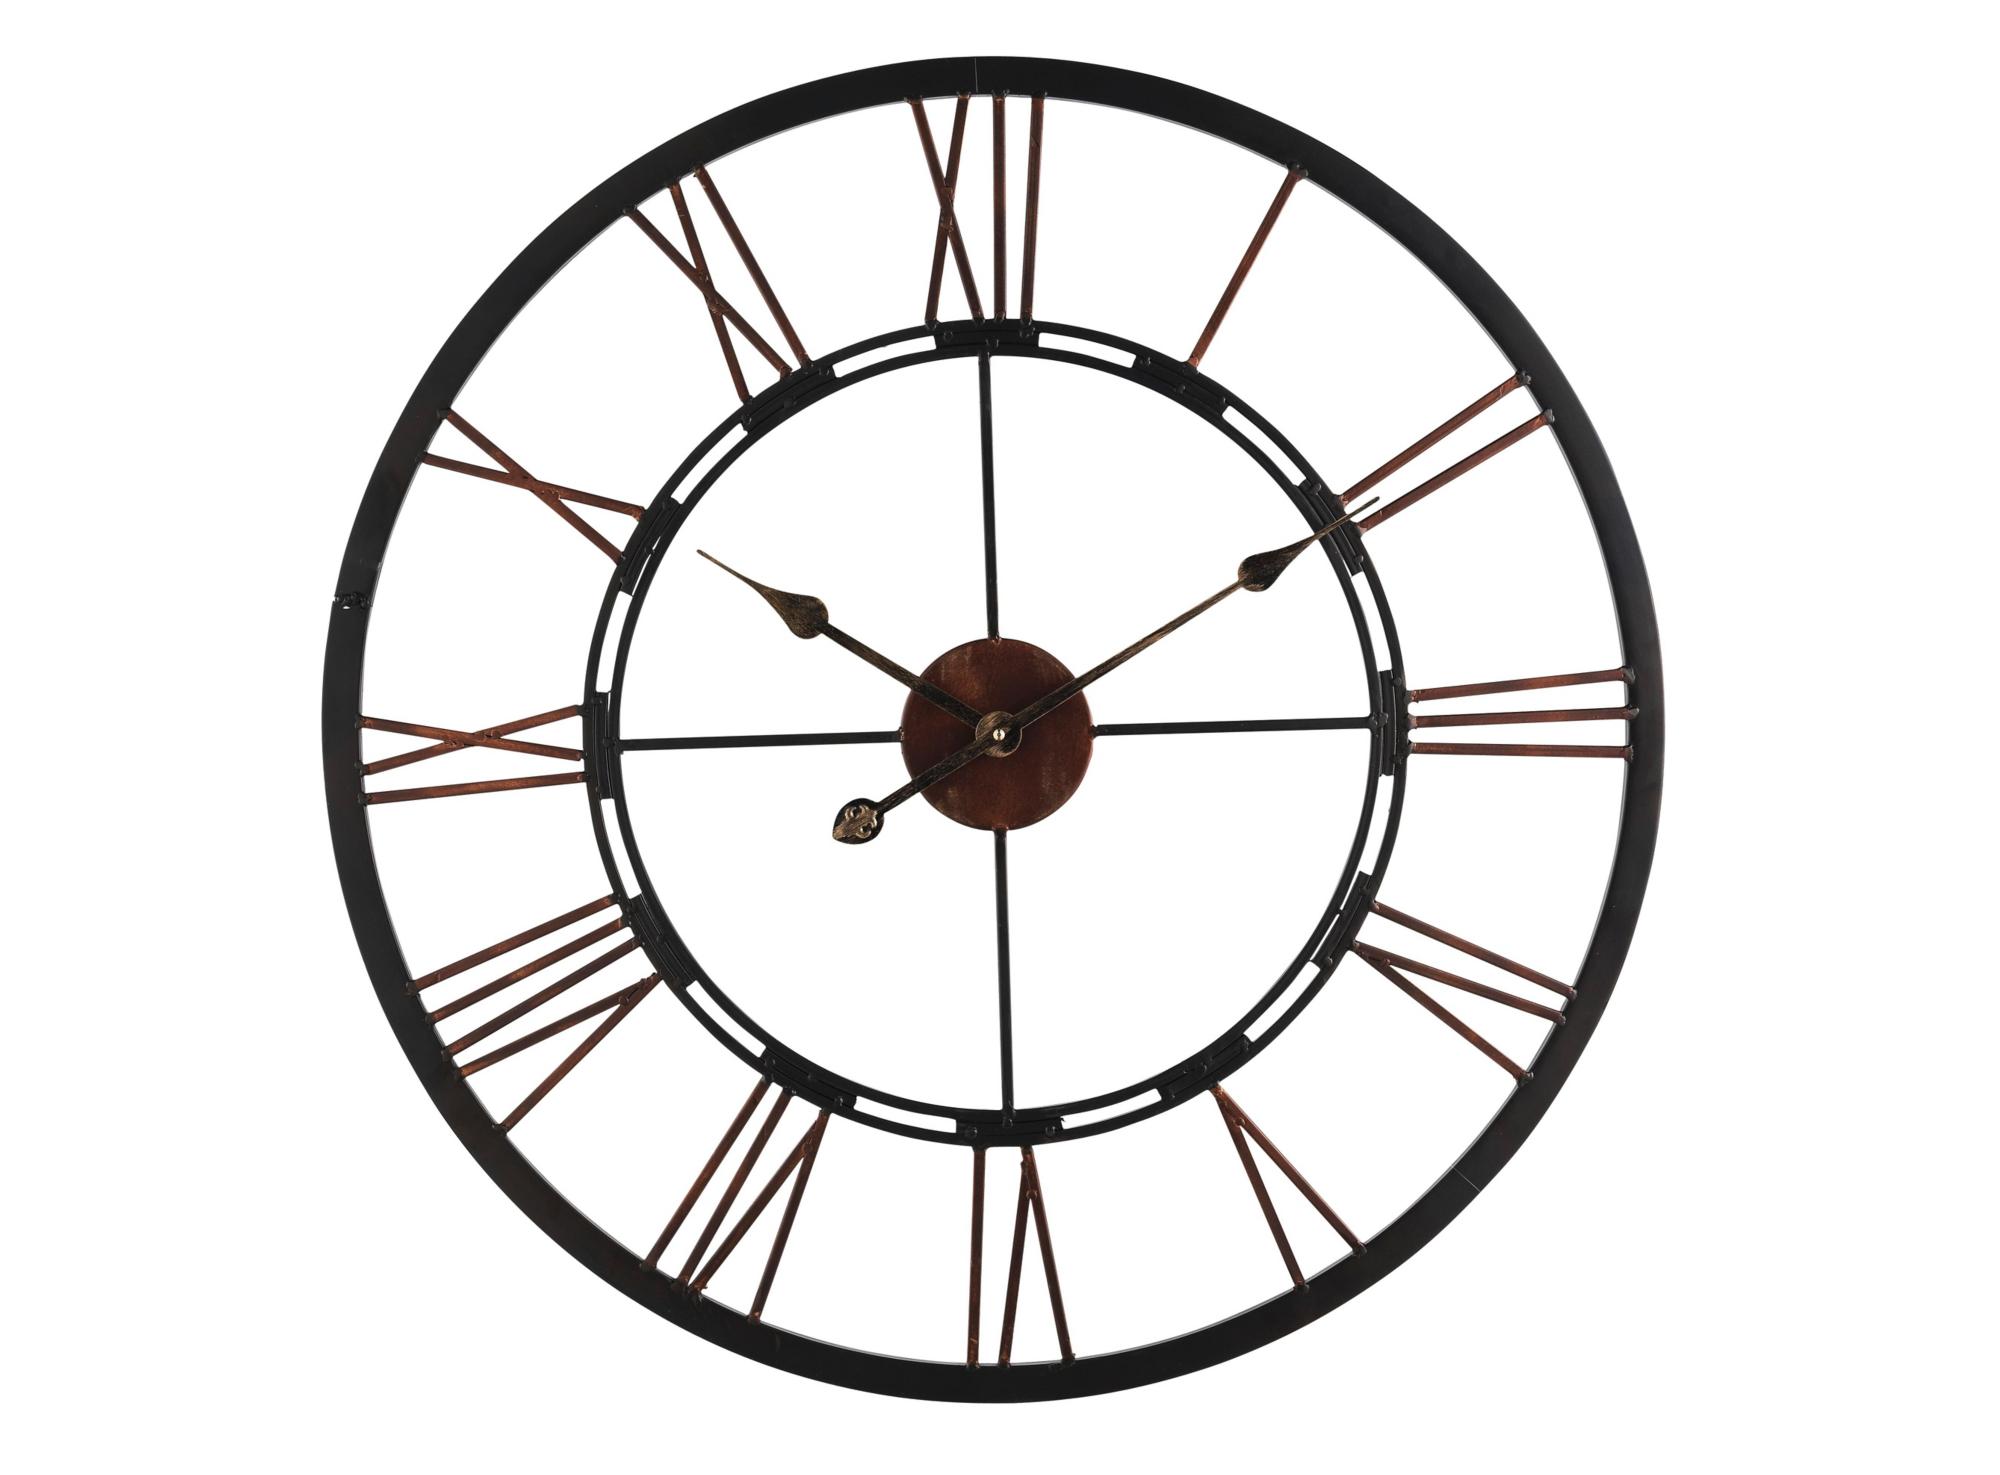 Horloge en fer noir horloge d co murale - Horloge murale grande taille ...